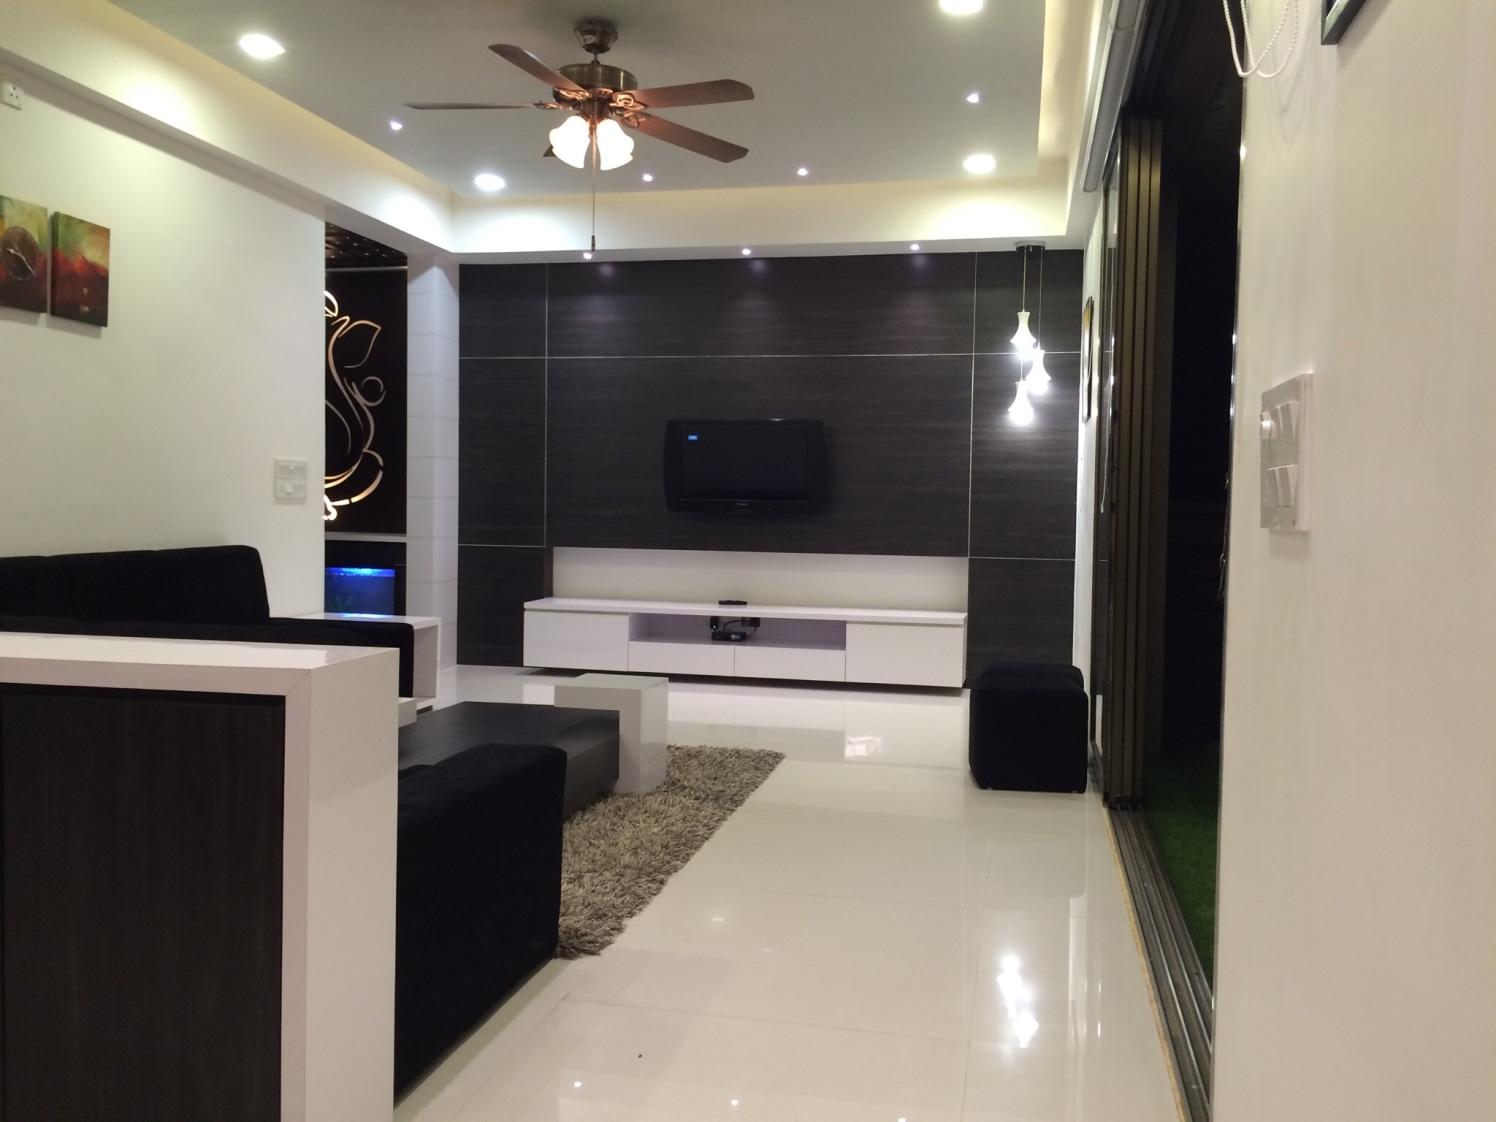 Spacious hallway with  L shape sofa  with marble flooring and false ceiling by Vatsal Hadvani Living-room Contemporary | Interior Design Photos & Ideas